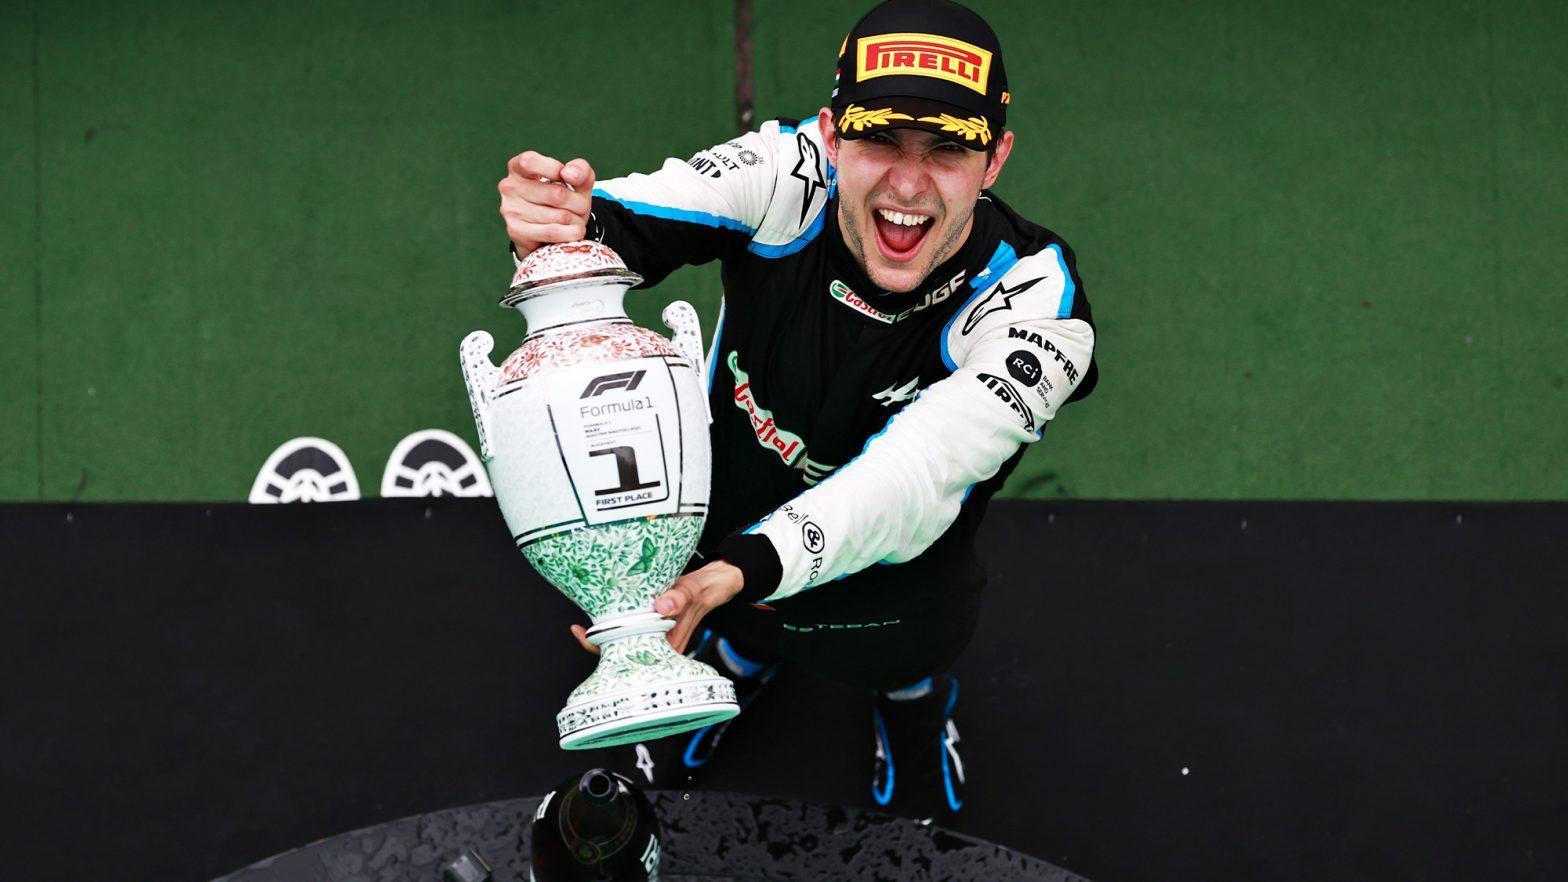 Esteban Ocon wins Hungarian GP 2021_40.1